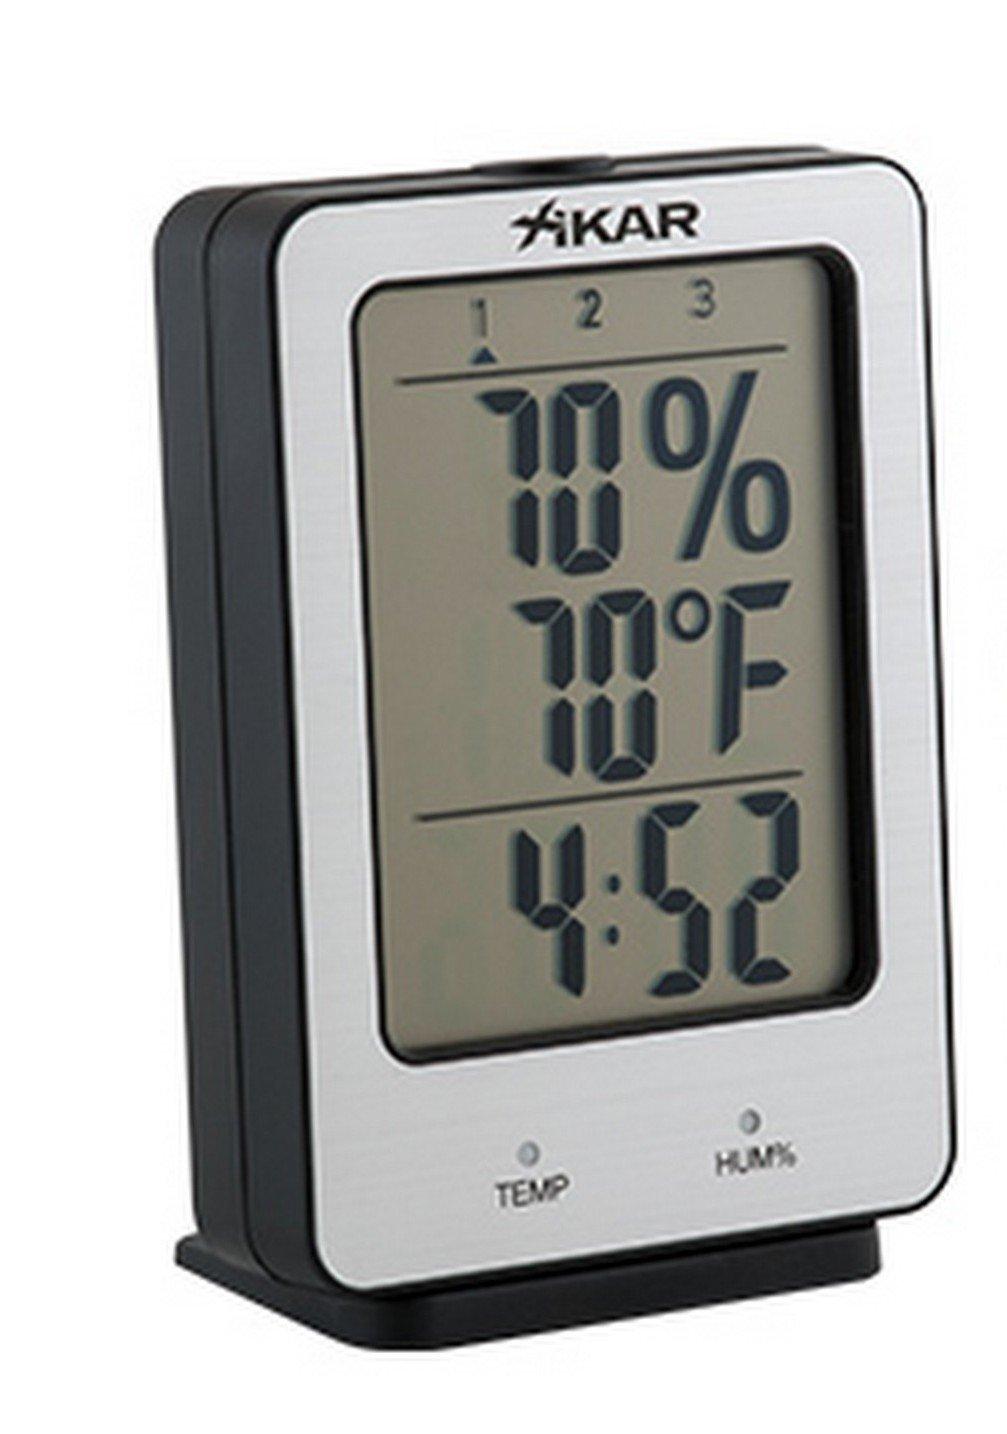 Xikar PuroTemp Hygrometer System